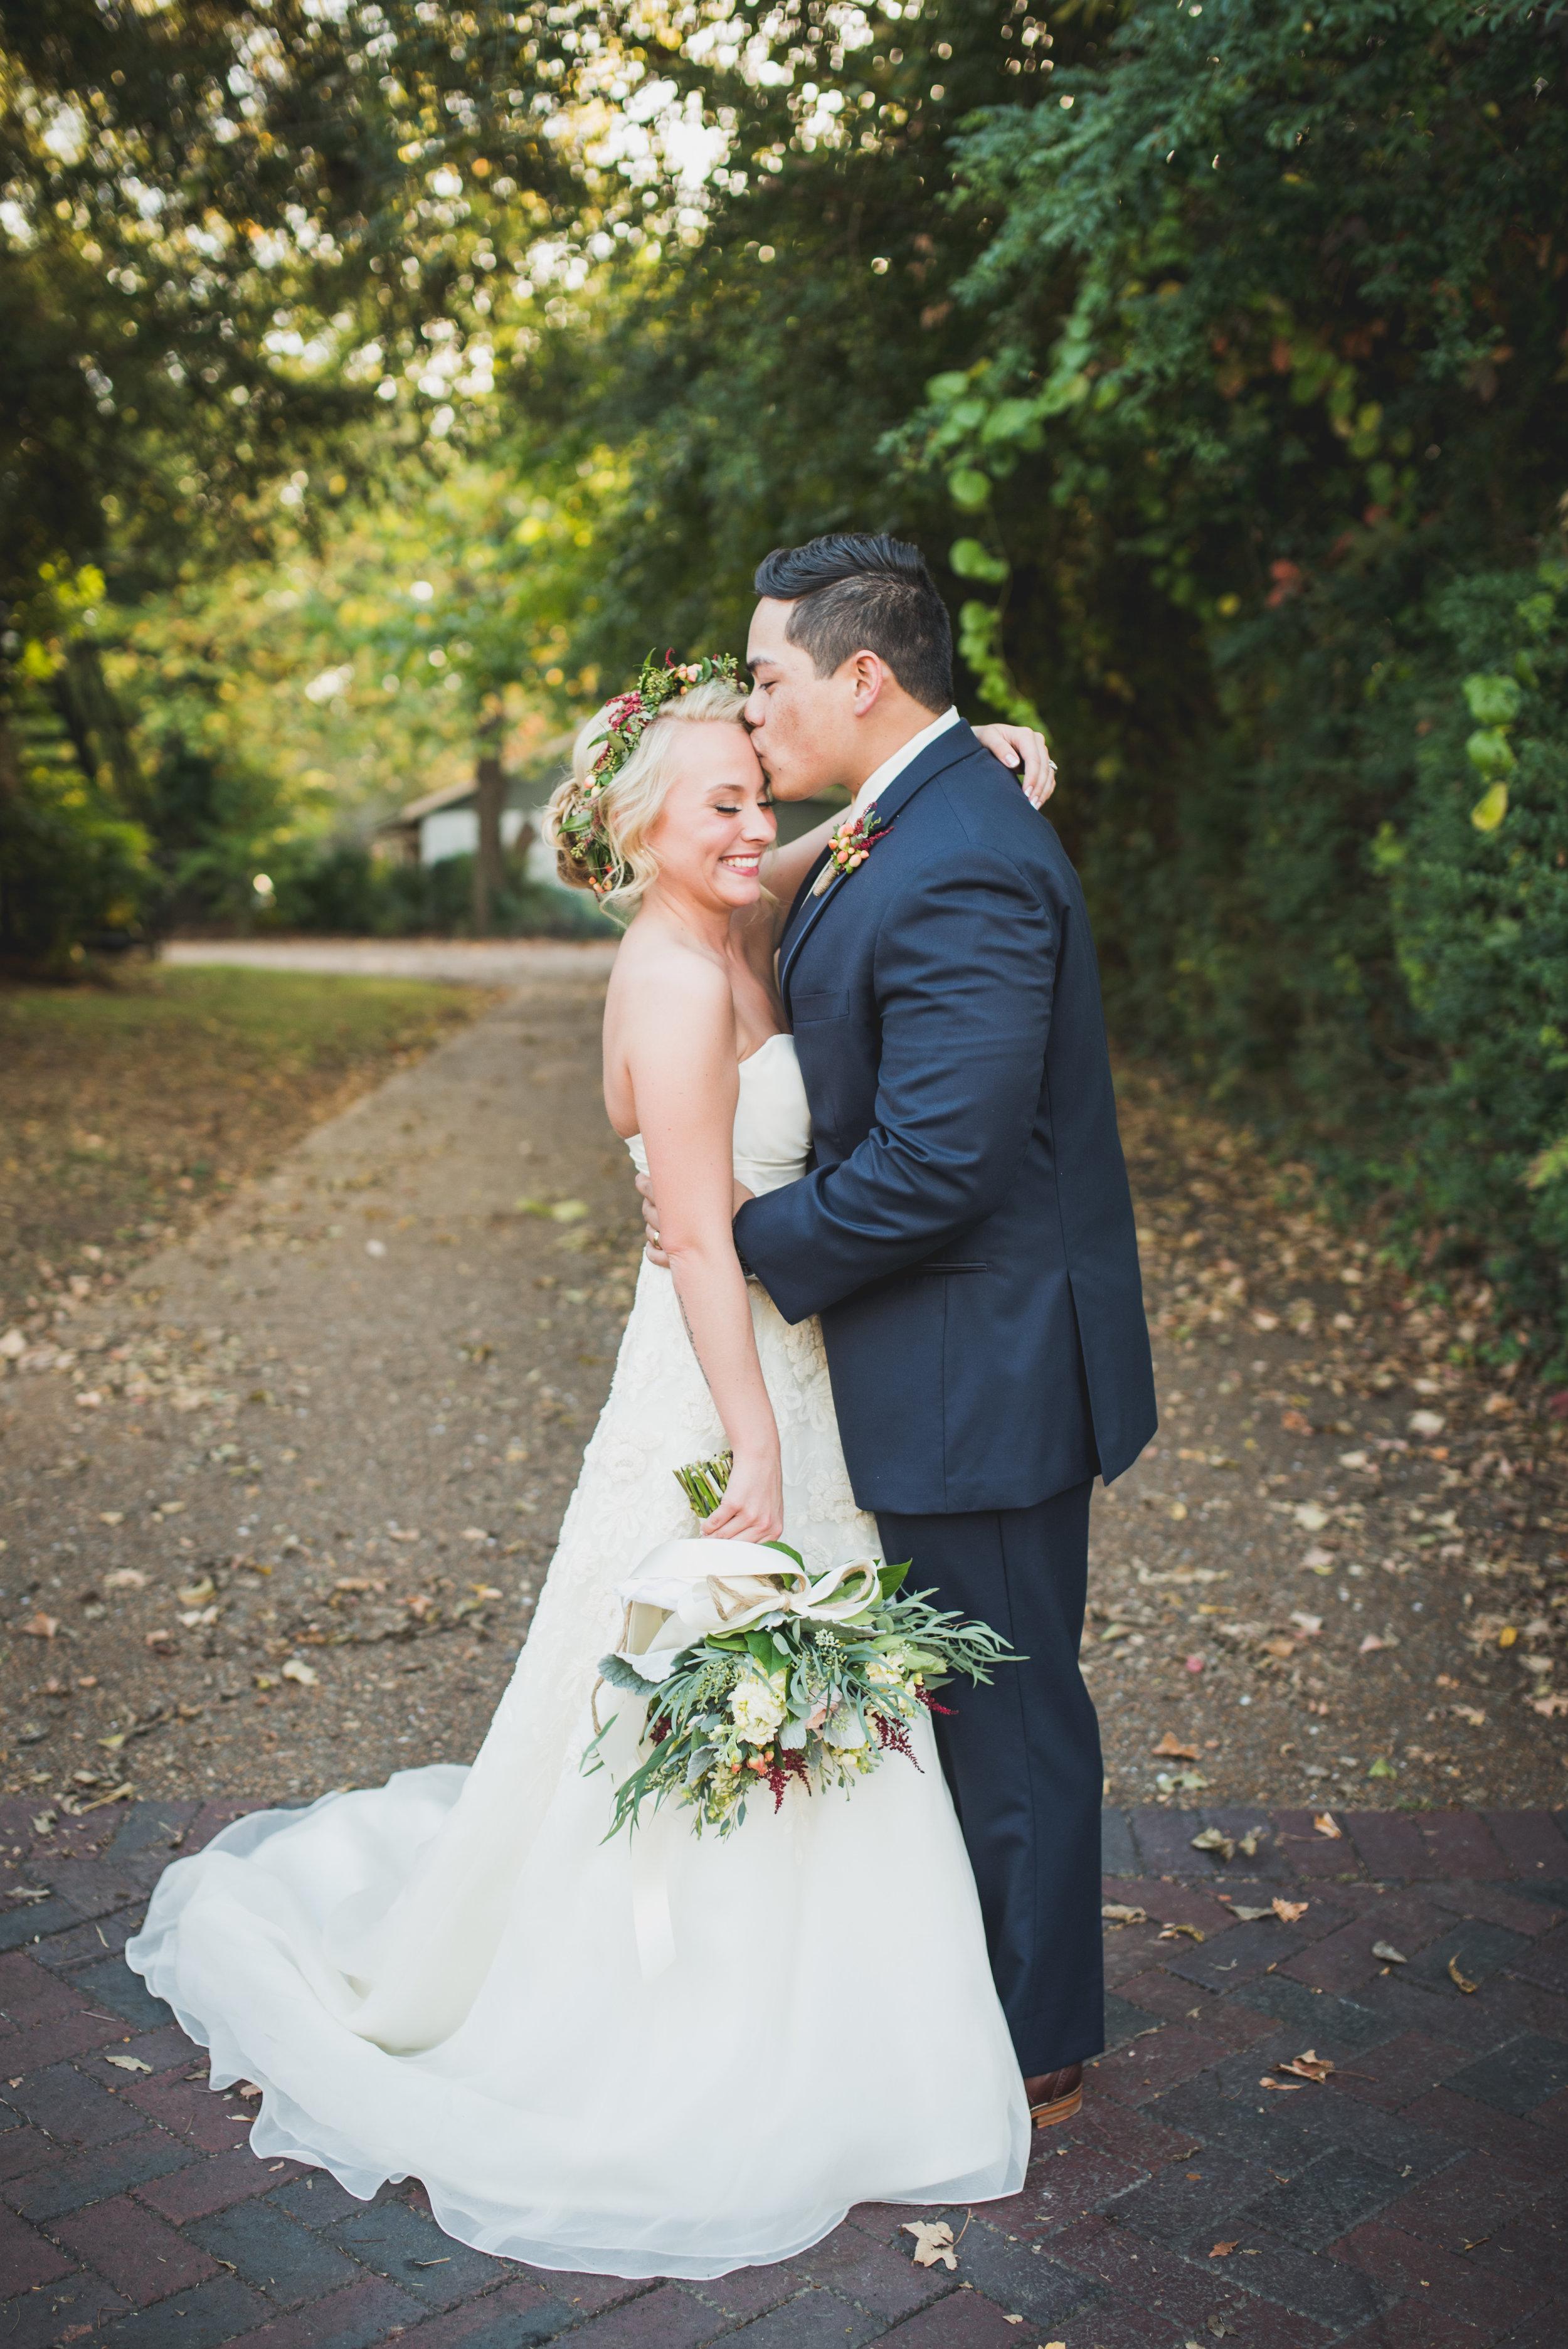 Nashville-wedding-photographers-CJ's-Off-The-Square-39.JPG